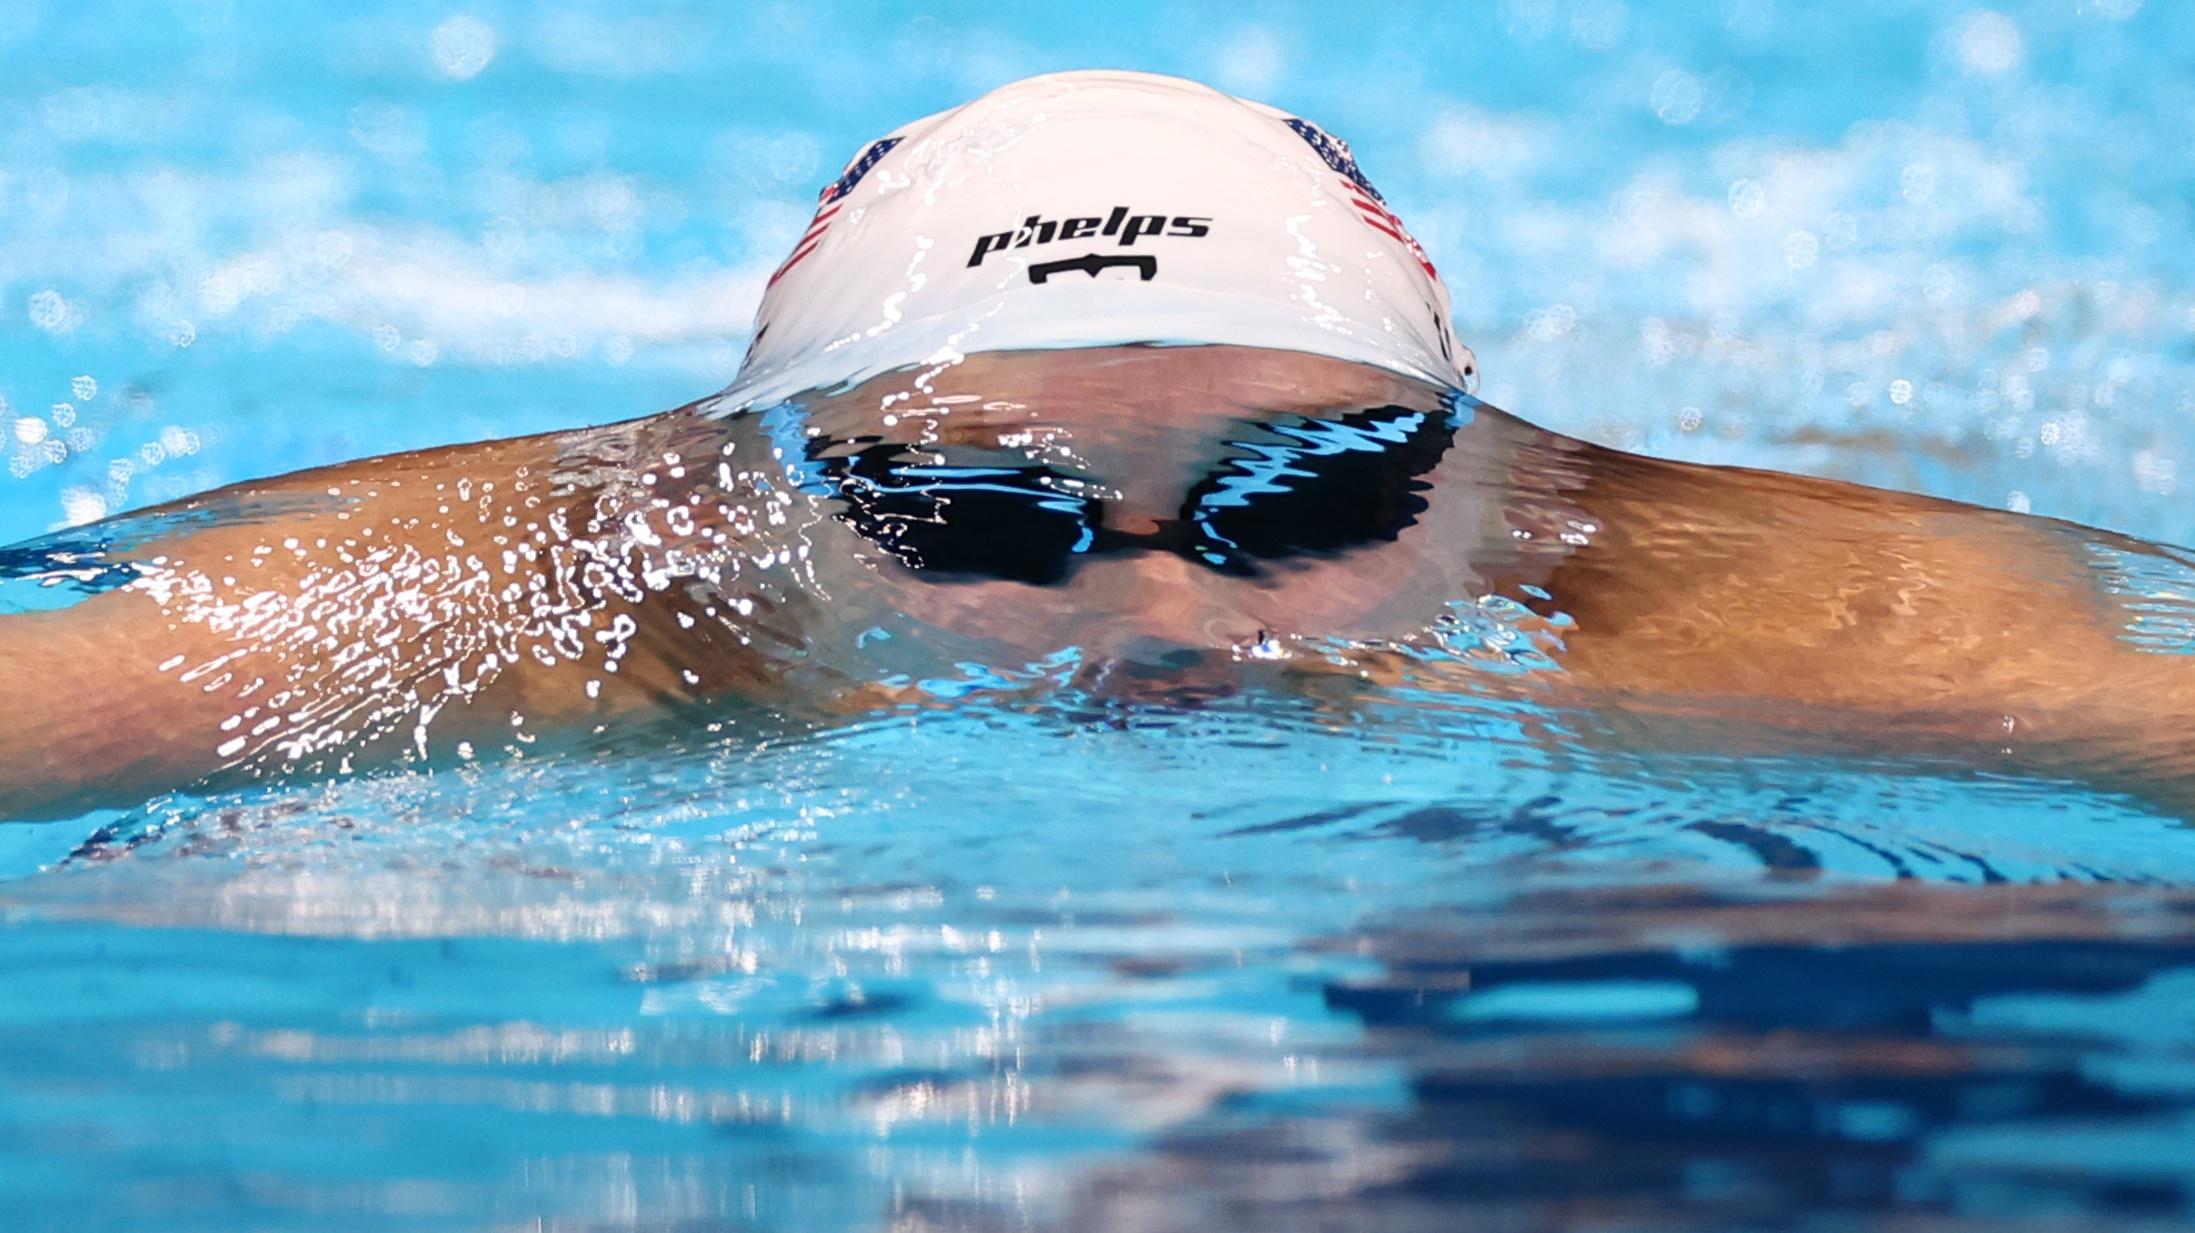 Tokyo 2020 Olympics - Swimming - Men's 400m Individual Medley - Finals - Tokyo Aquatics Centre - Tokyo, Japan - July 25, 2021. Chase Kalisz of the United States in action REUTERS/Kai Pfaffenbach